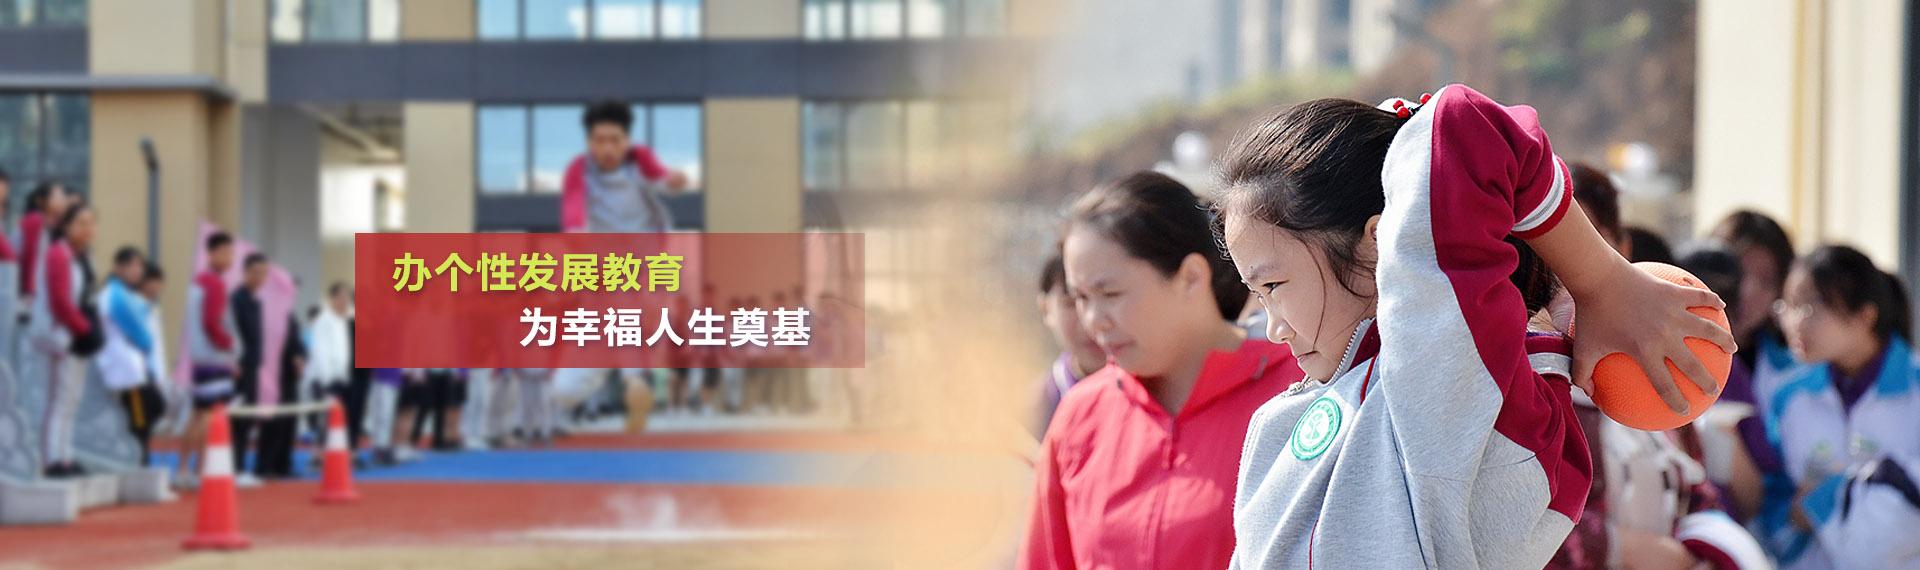 http://www.lzhmzz.com/lanzhoulvyou/150673.html